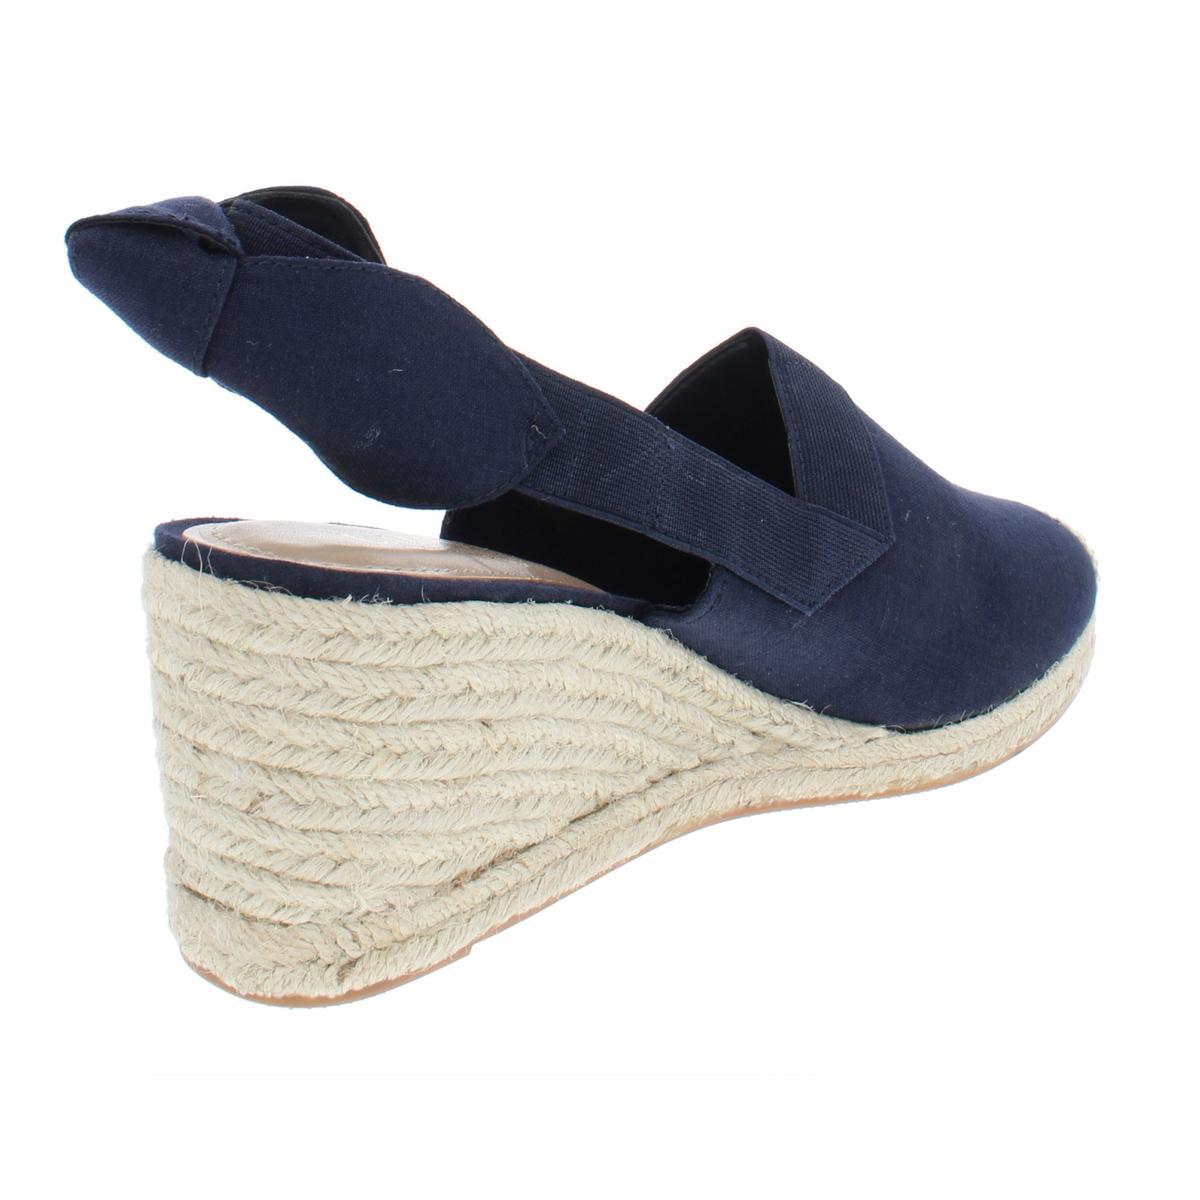 Lauren-Ralph-Lauren-Womens-Helma-Textured-Sandals-Espadrilles-Wedges-BHFO-6966 thumbnail 4